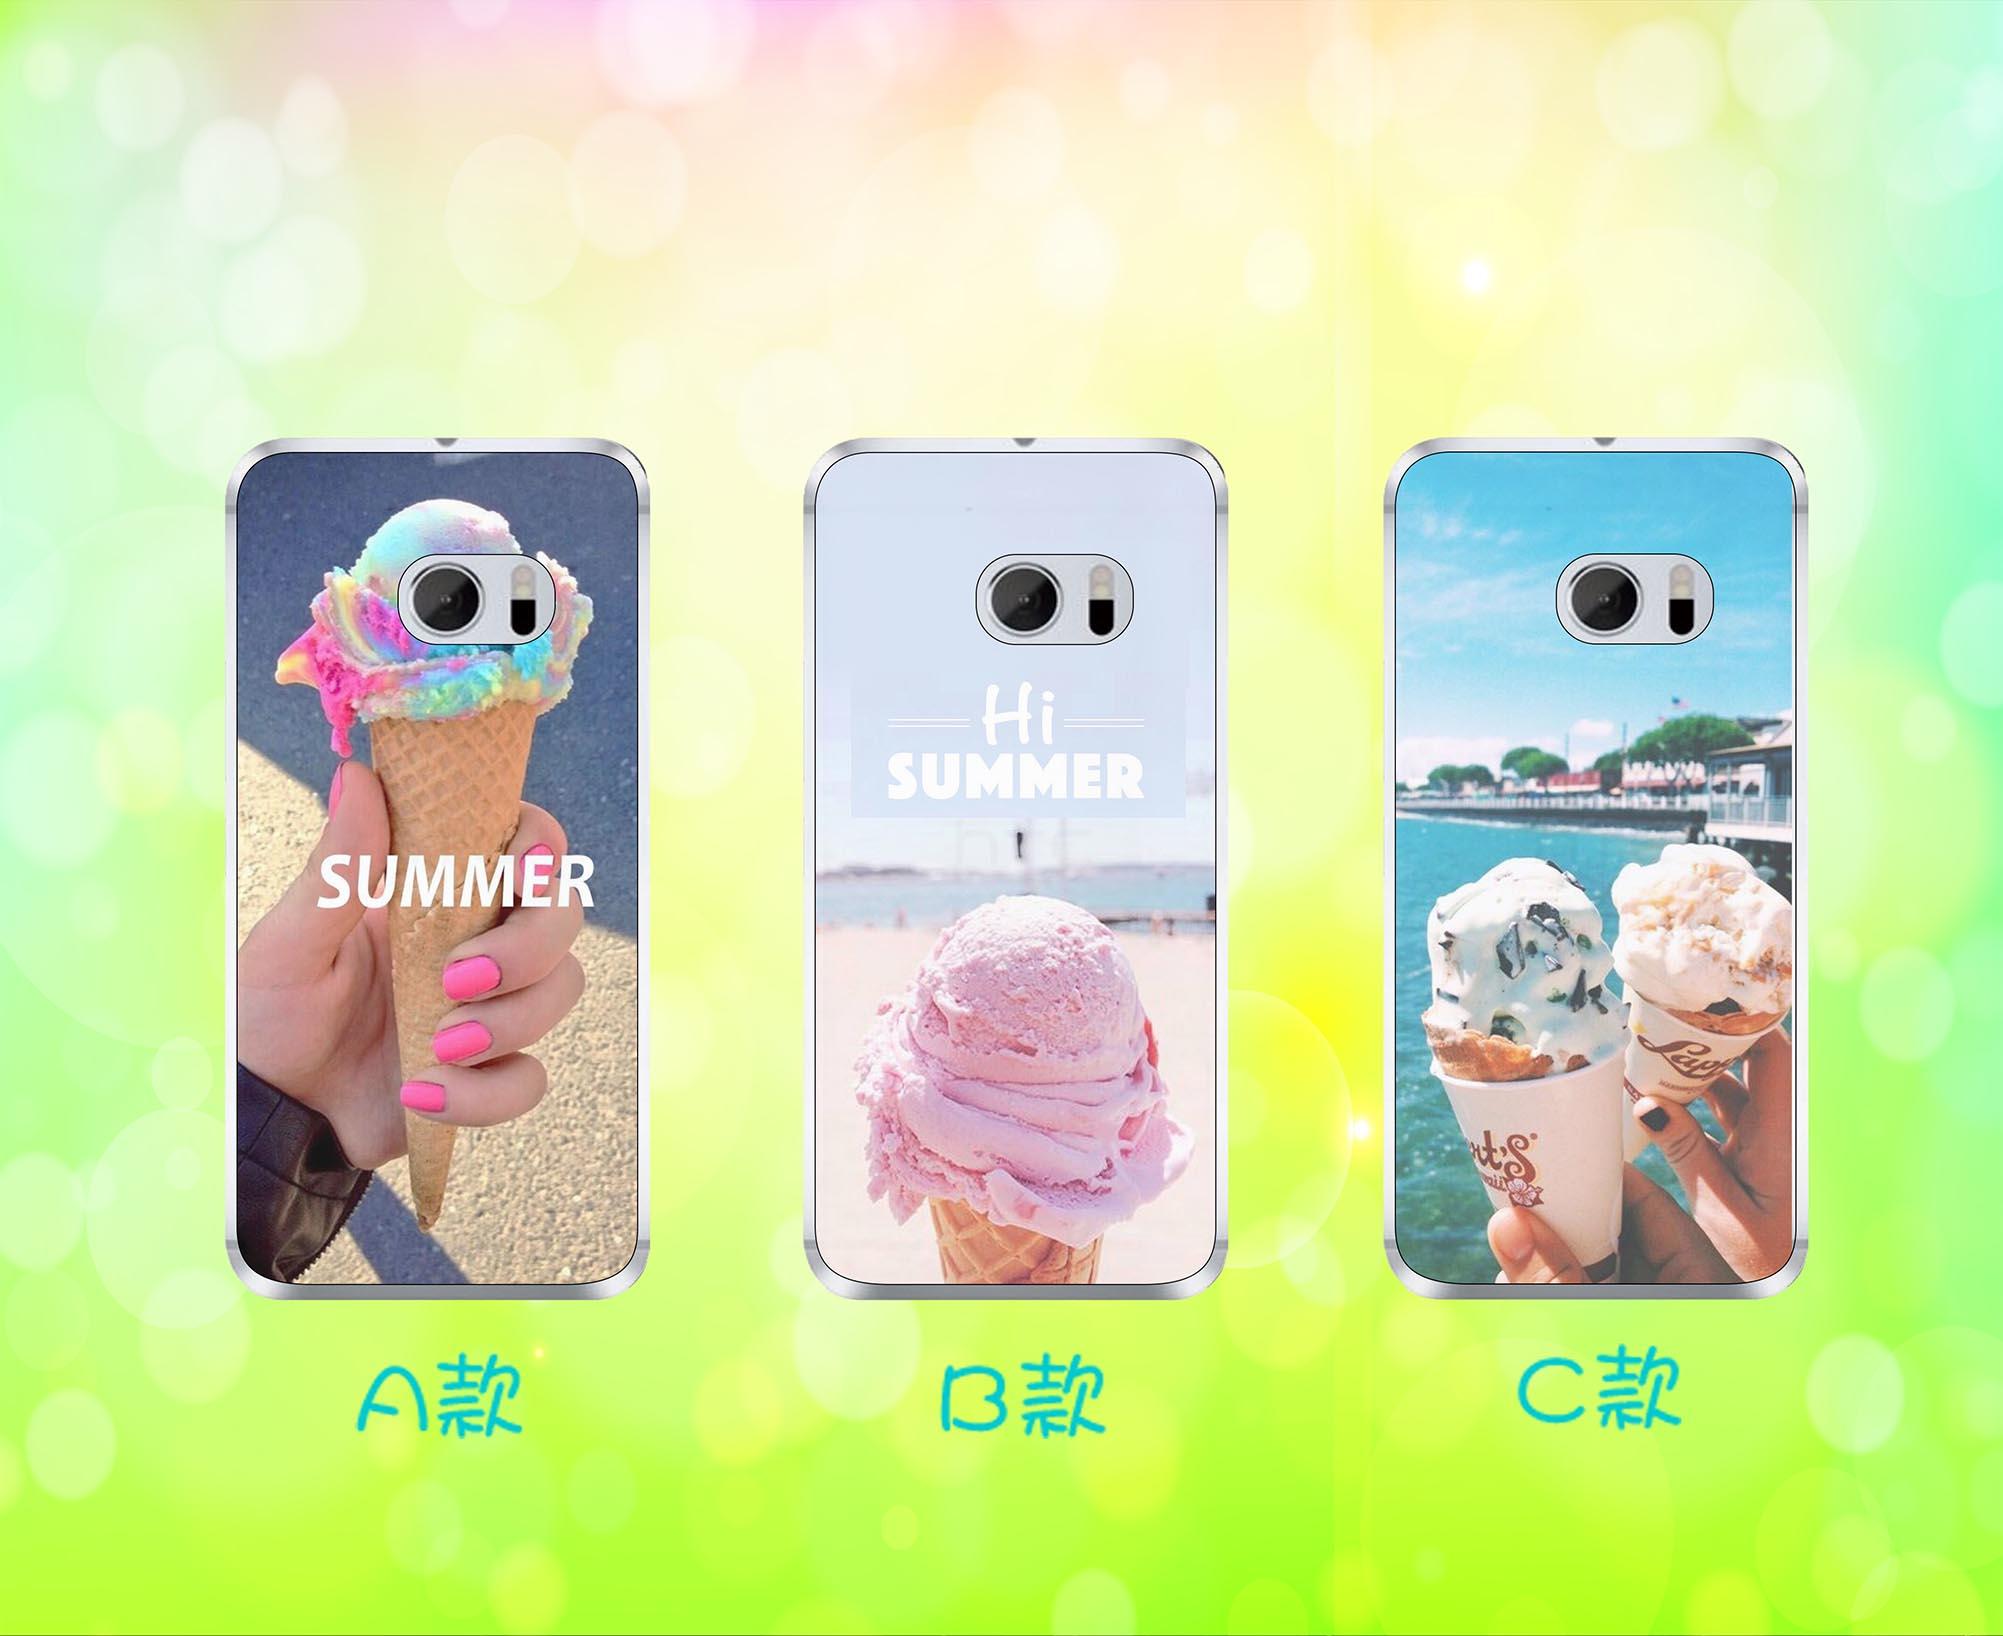 [HTC] ✨夏日系列透明軟殼 ✨[M8,M9,M9+,M10,D816,D820,D826,D728,A9,X9,728,825,830 ]